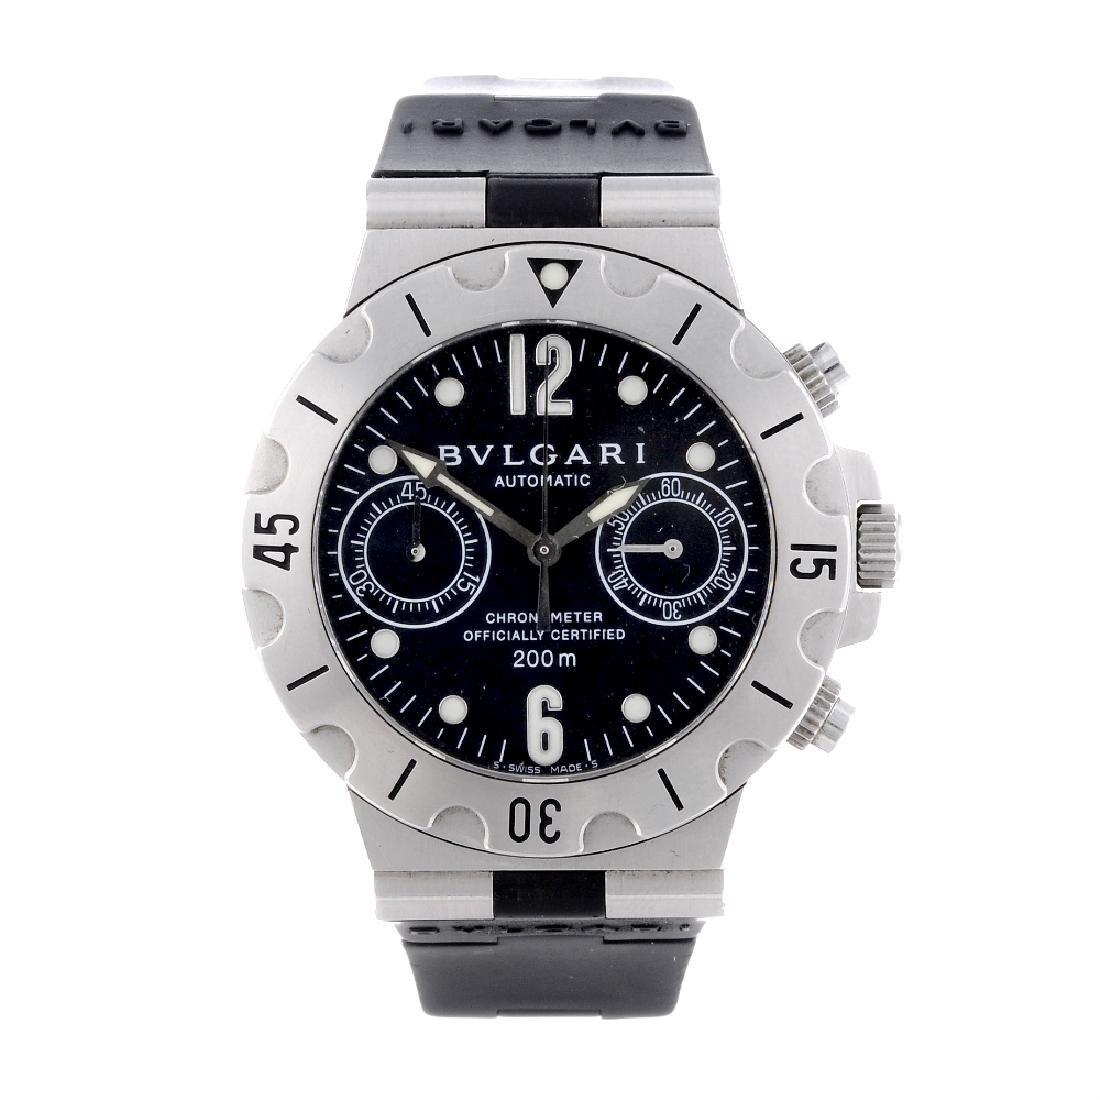 BULGARI - a gentleman's Diagono Scuba chronograph wrist